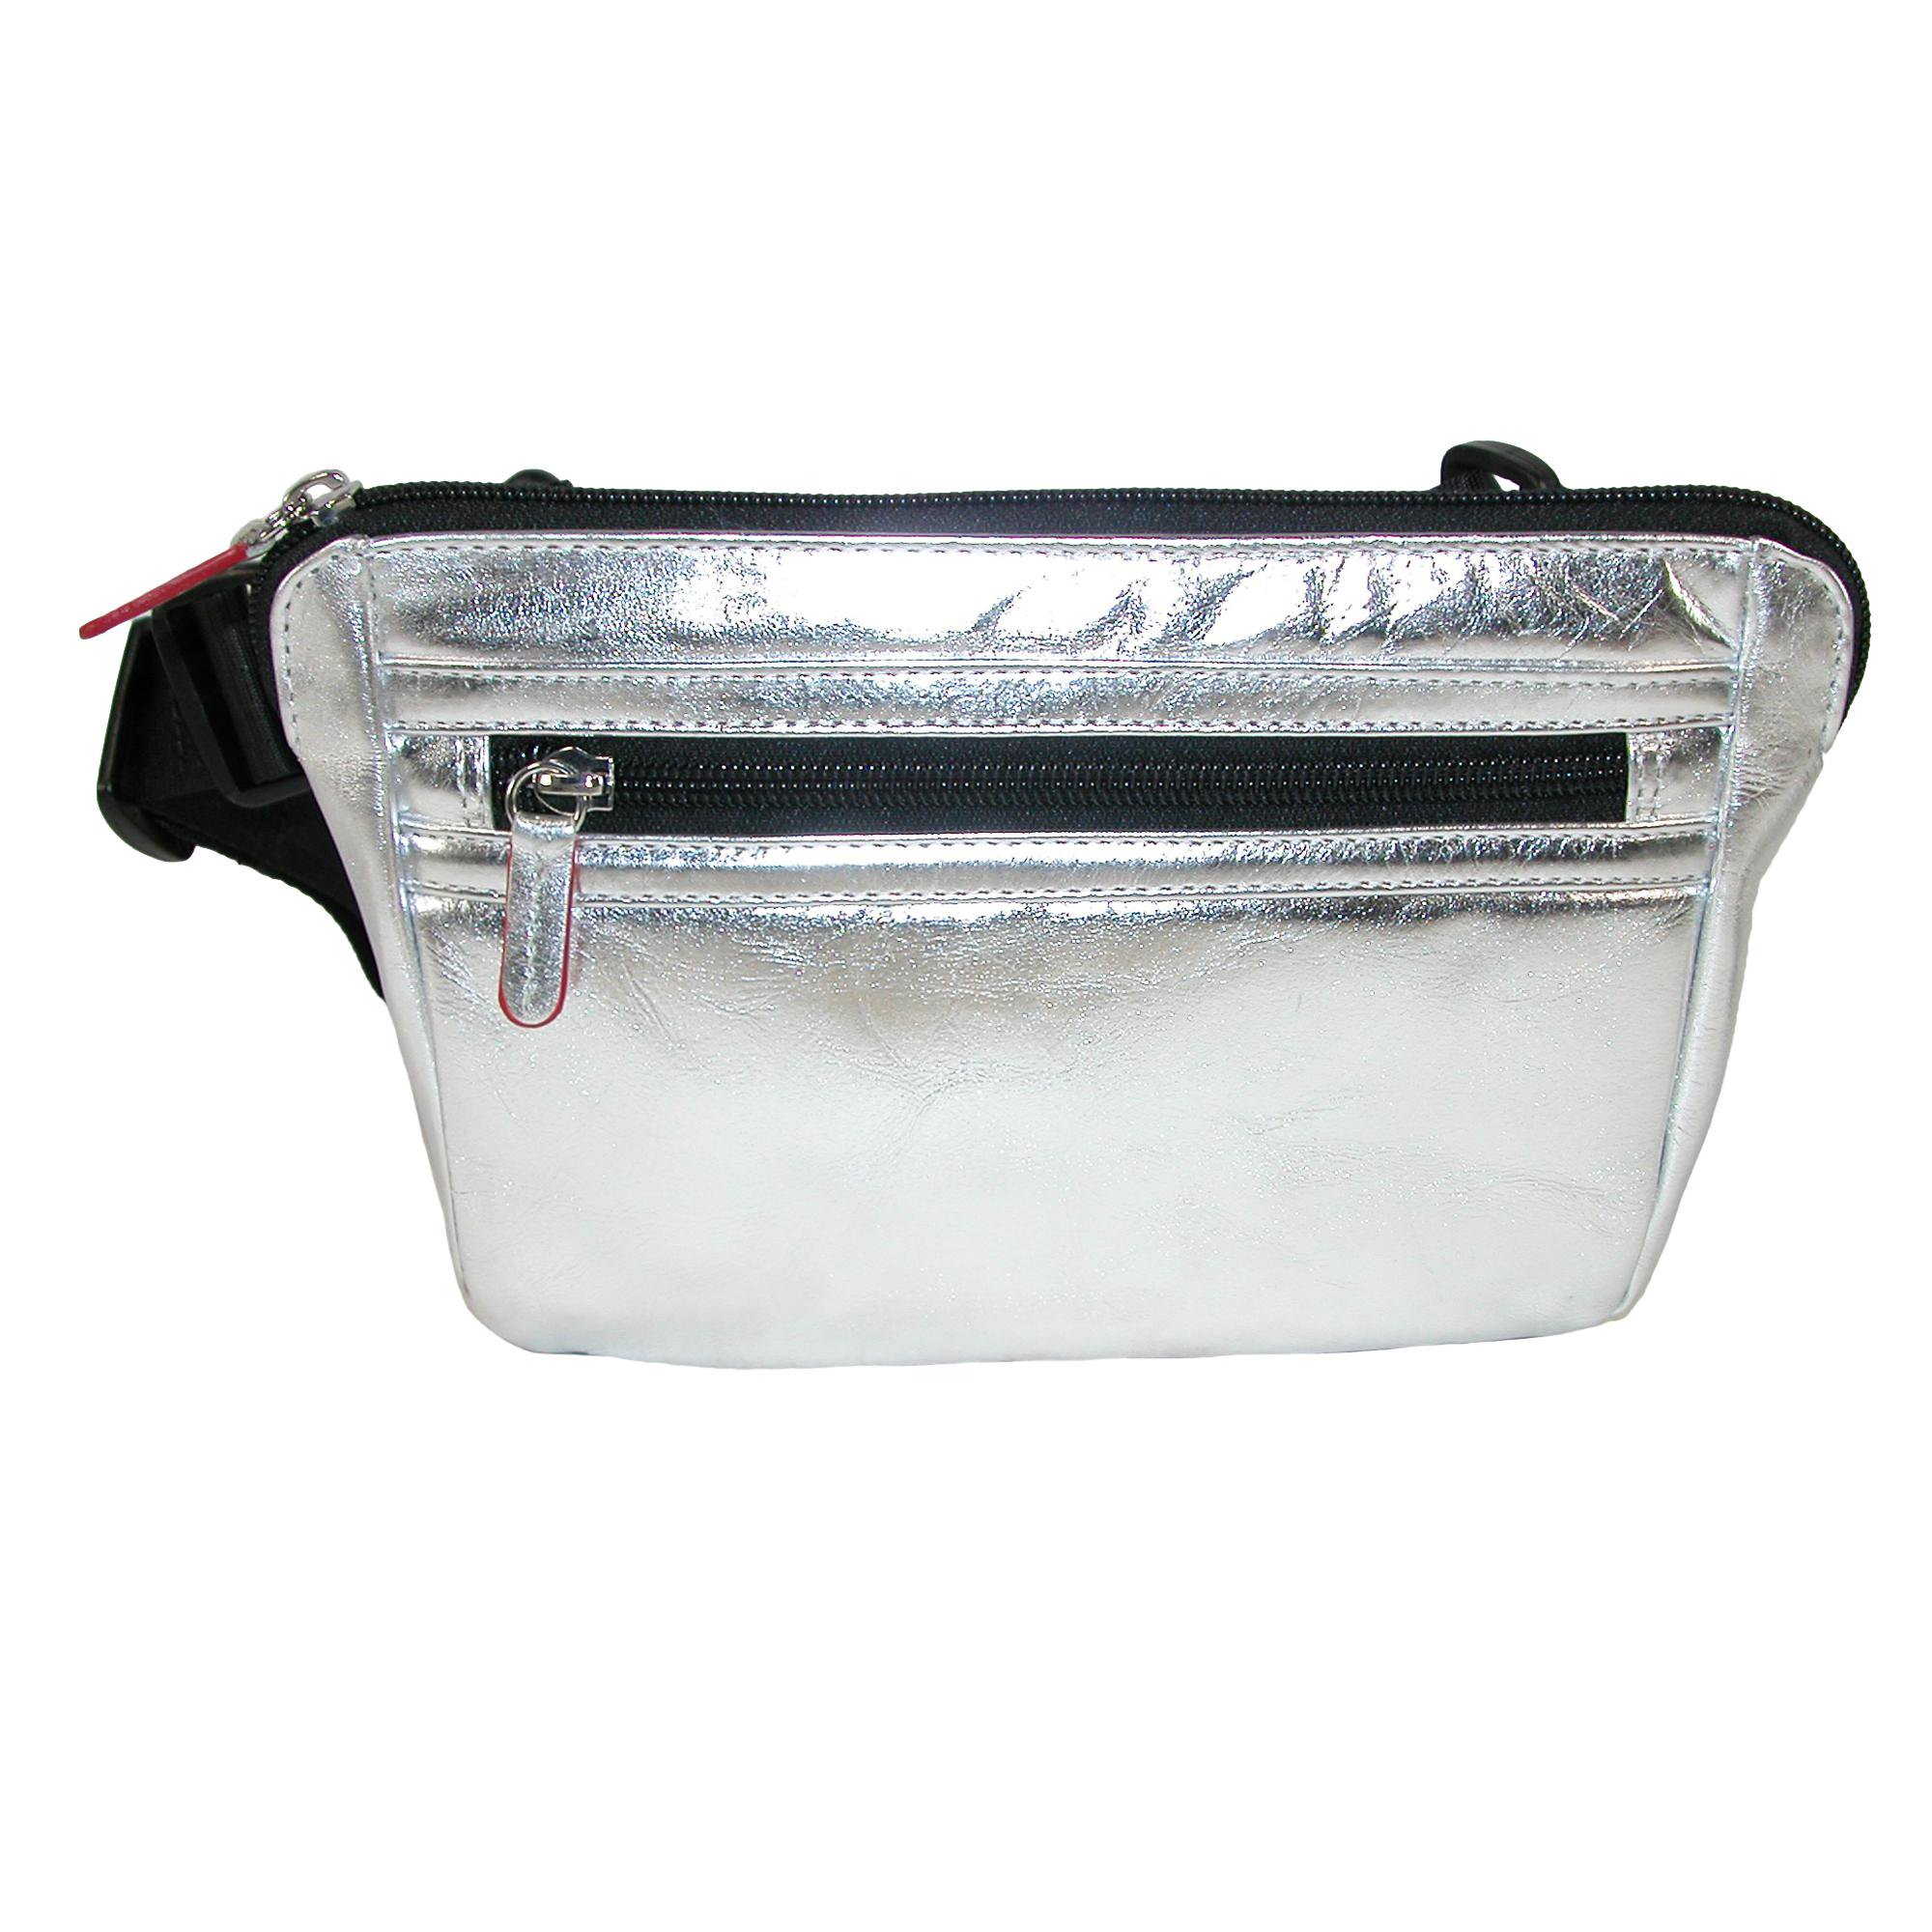 d4b15043594c ILI Leather Waistpack with RFID Protection | Walmart Canada